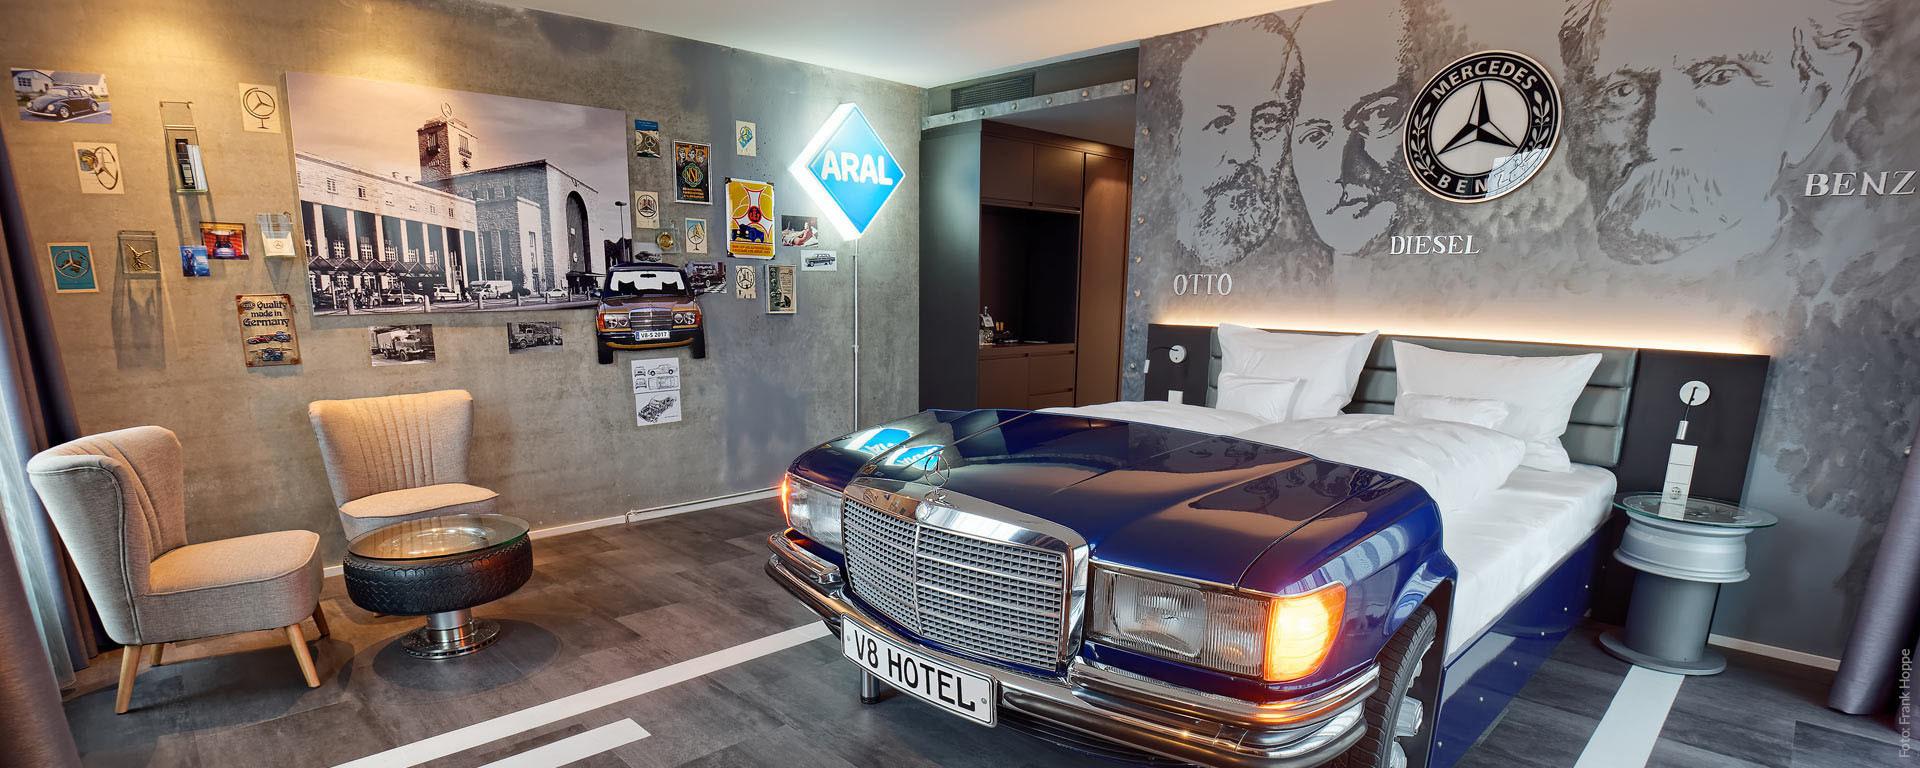 "V8 HOTEL ""PICK-UP"": Ein Hotel voller Highlights"